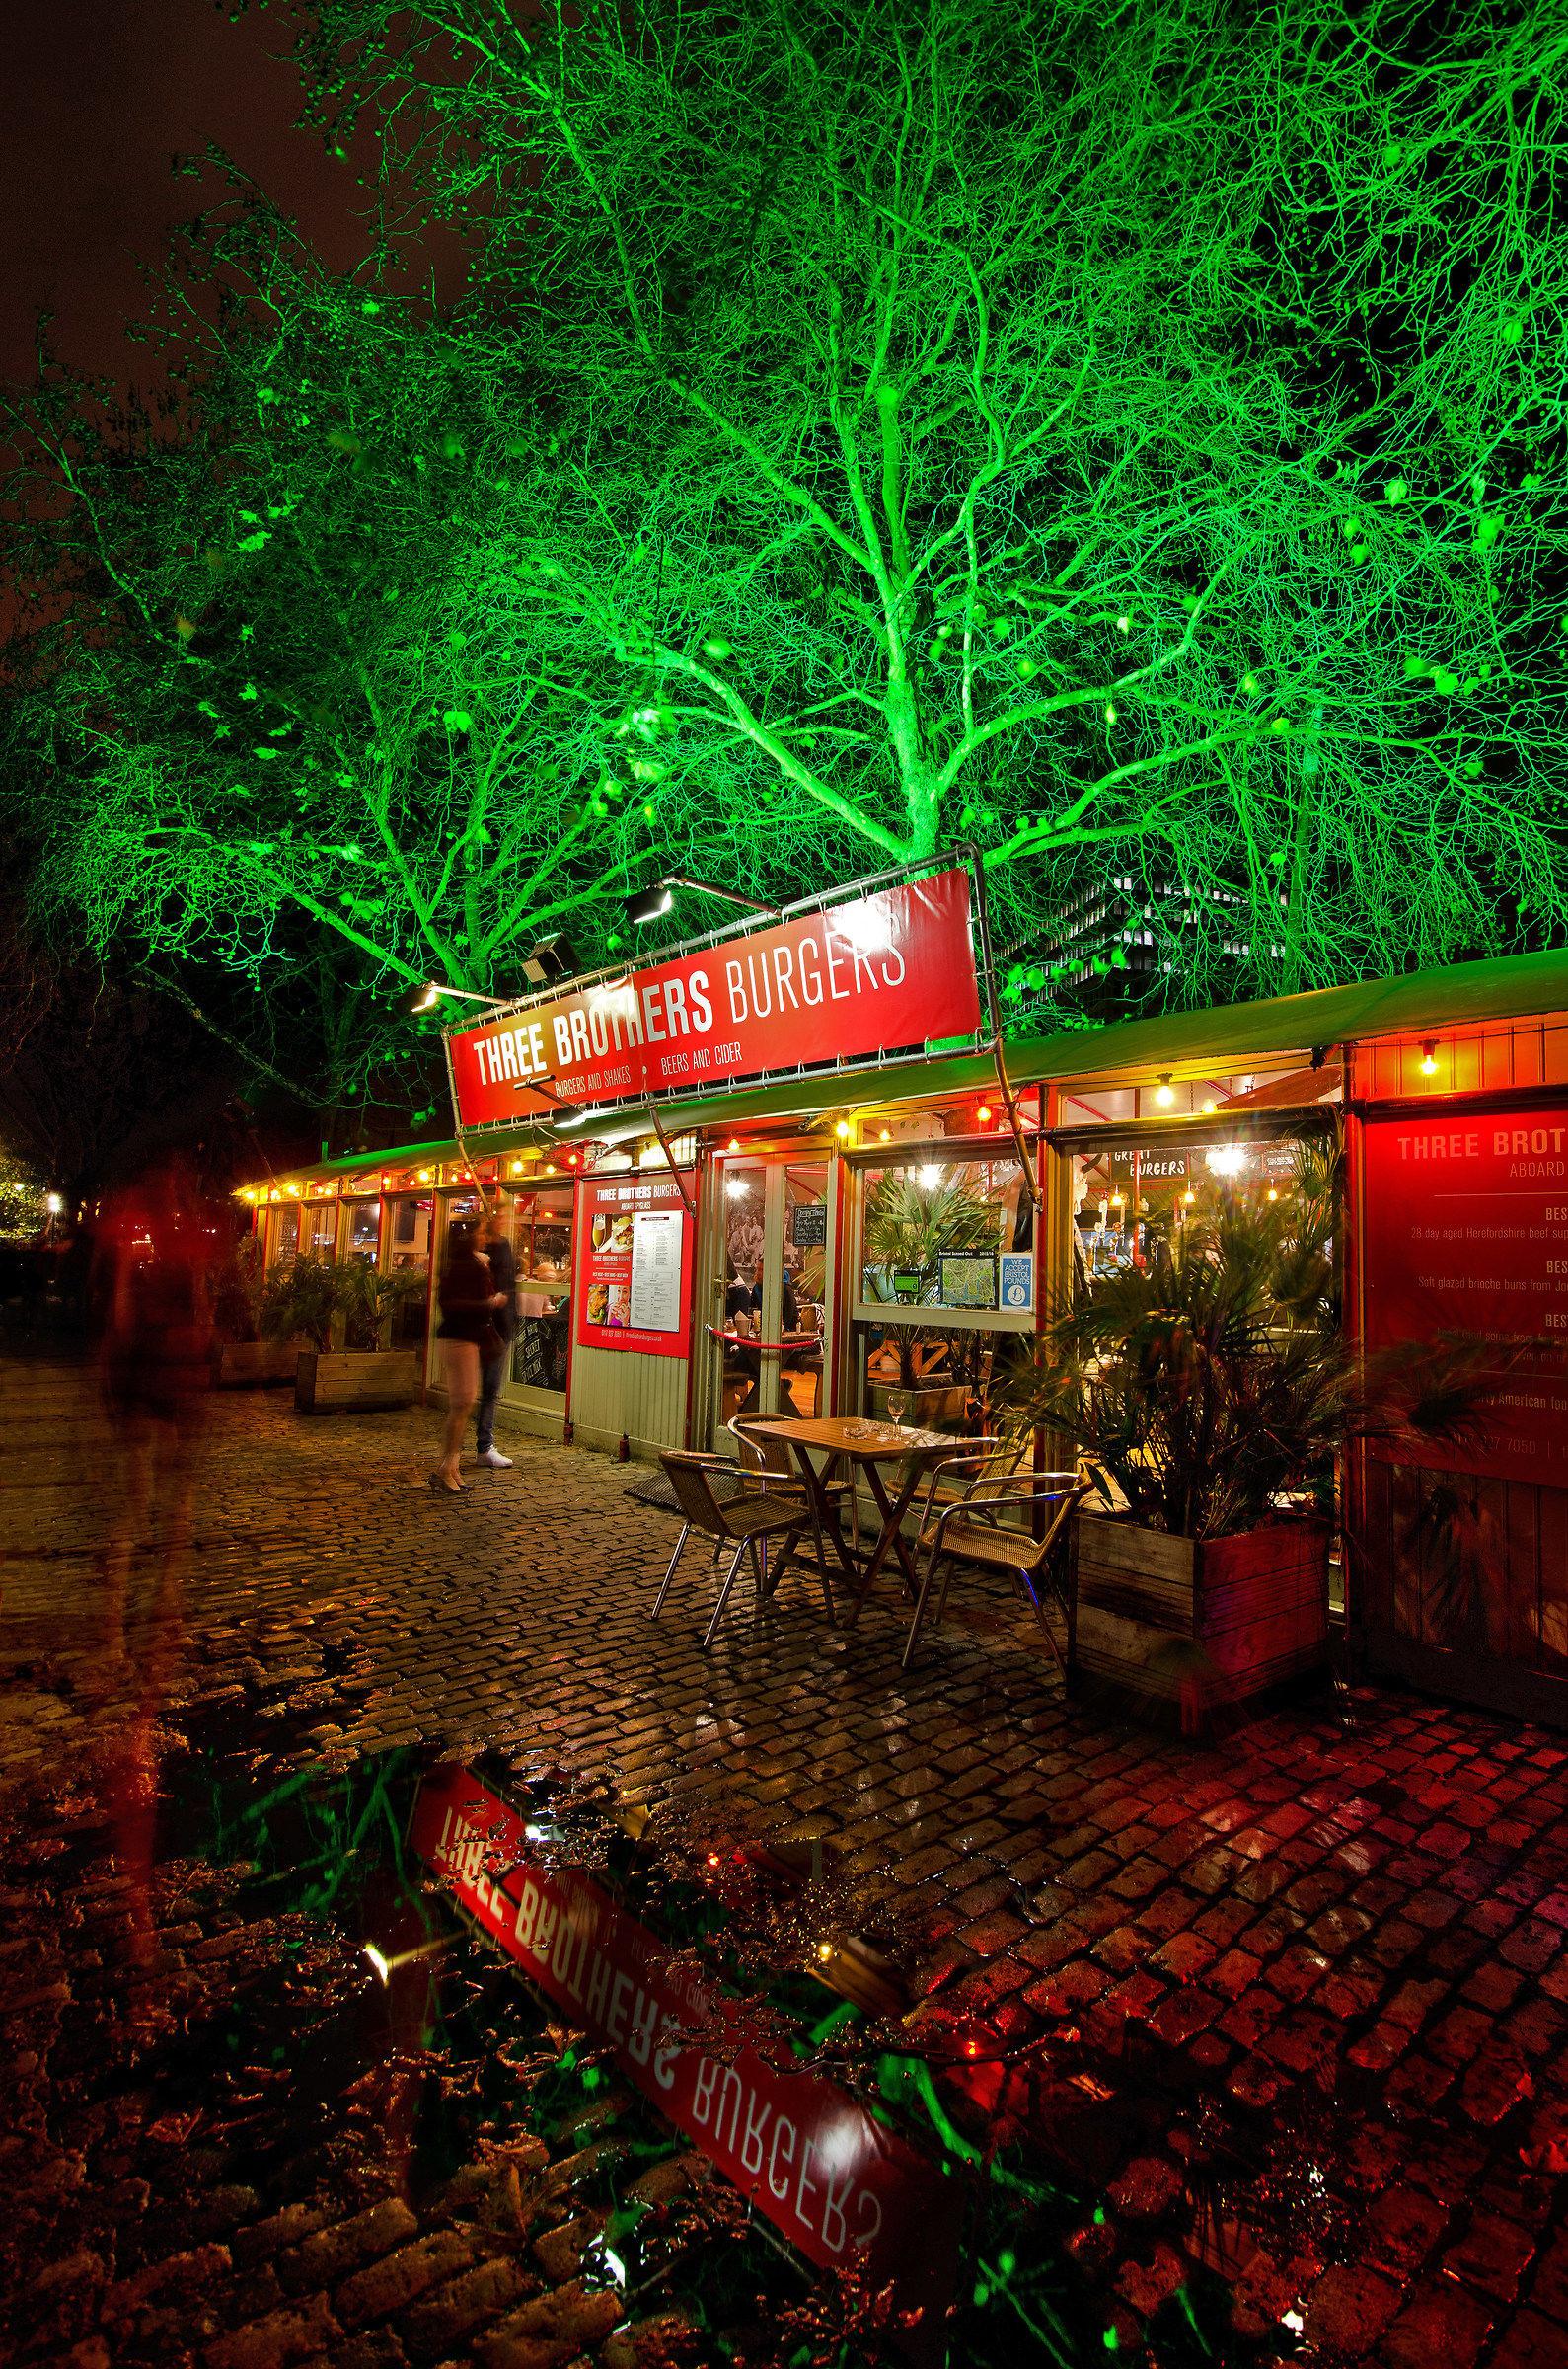 Friday Night Burgers......